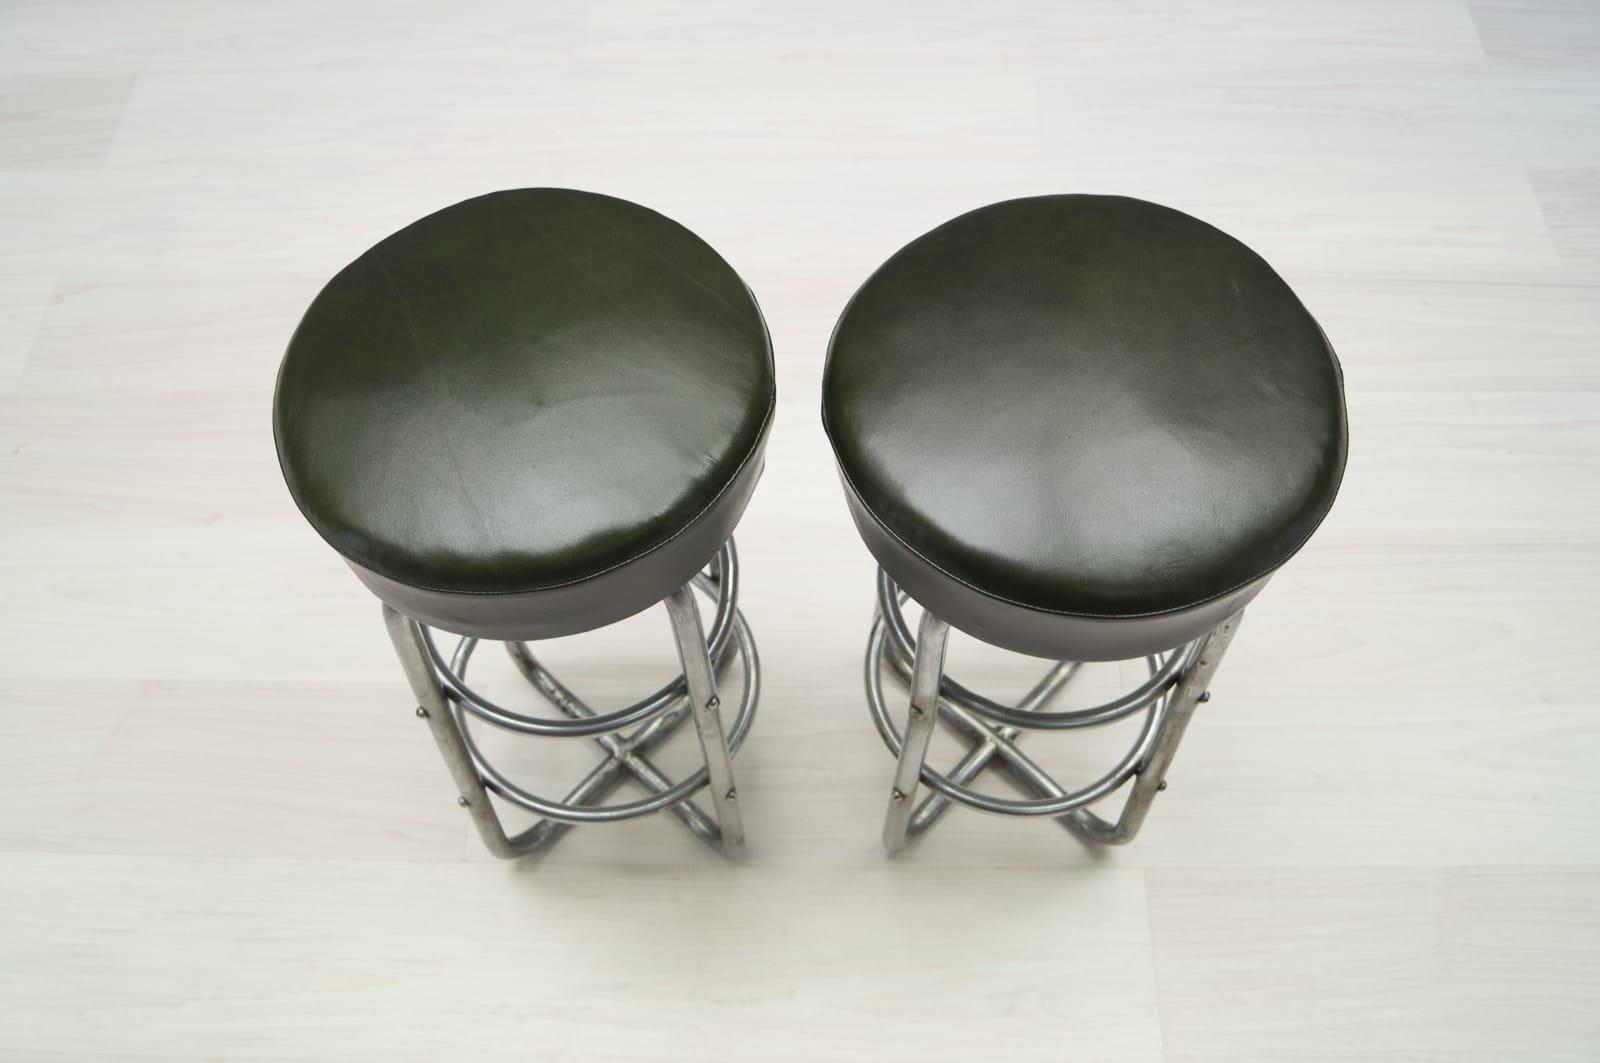 bauhaus art deco stahlrohr hocker 2er set bei pamono kaufen. Black Bedroom Furniture Sets. Home Design Ideas